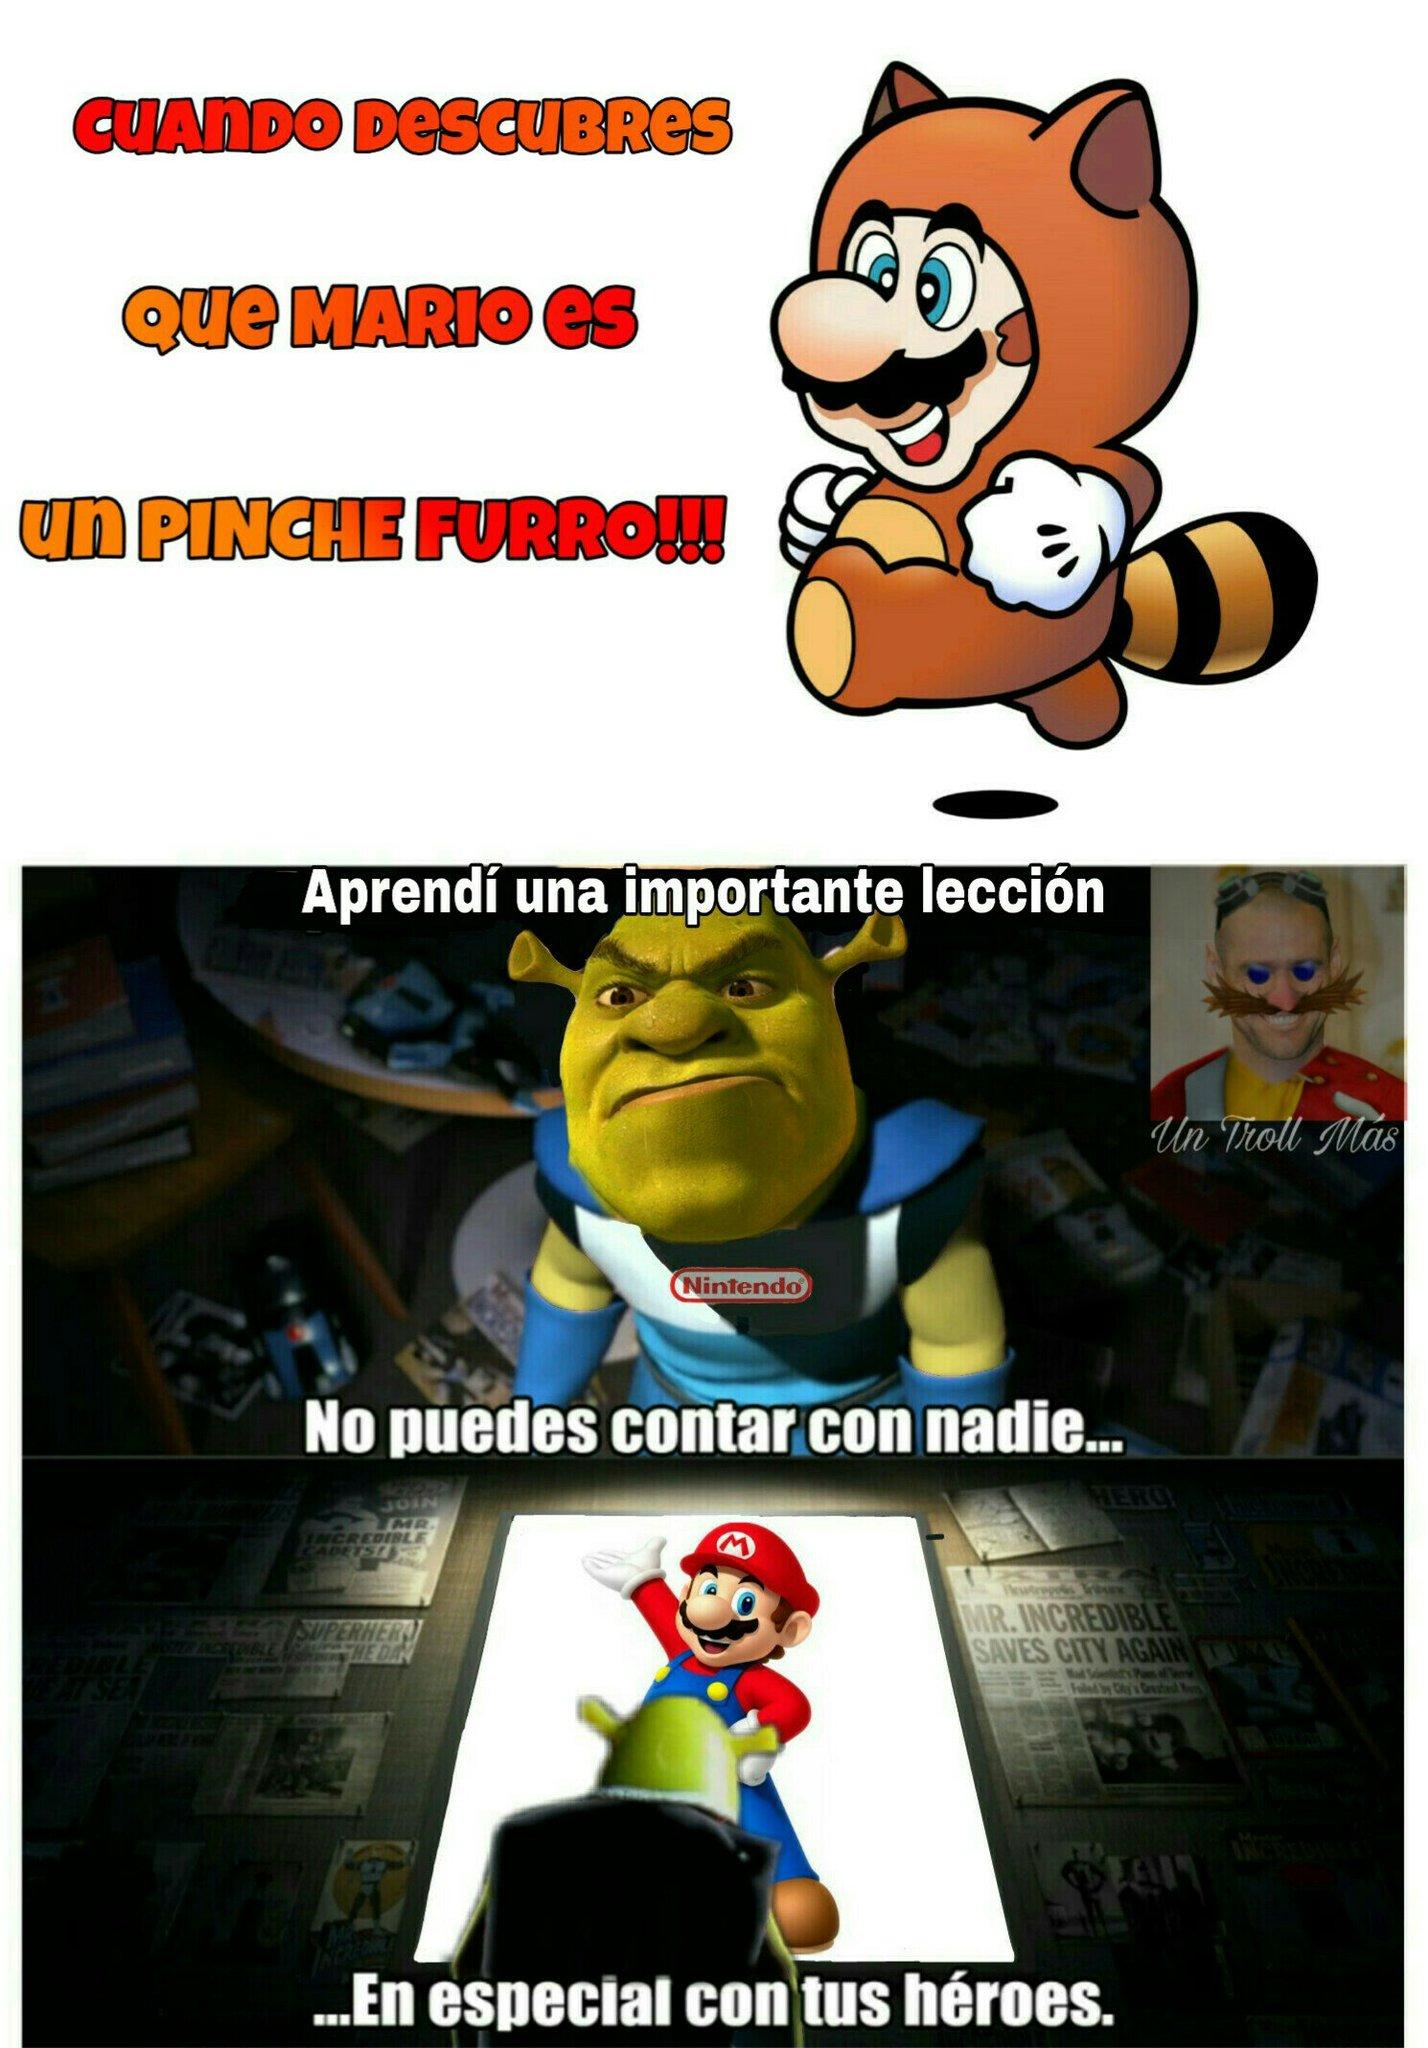 El Chuerk fanático de Nintendo, lol - meme